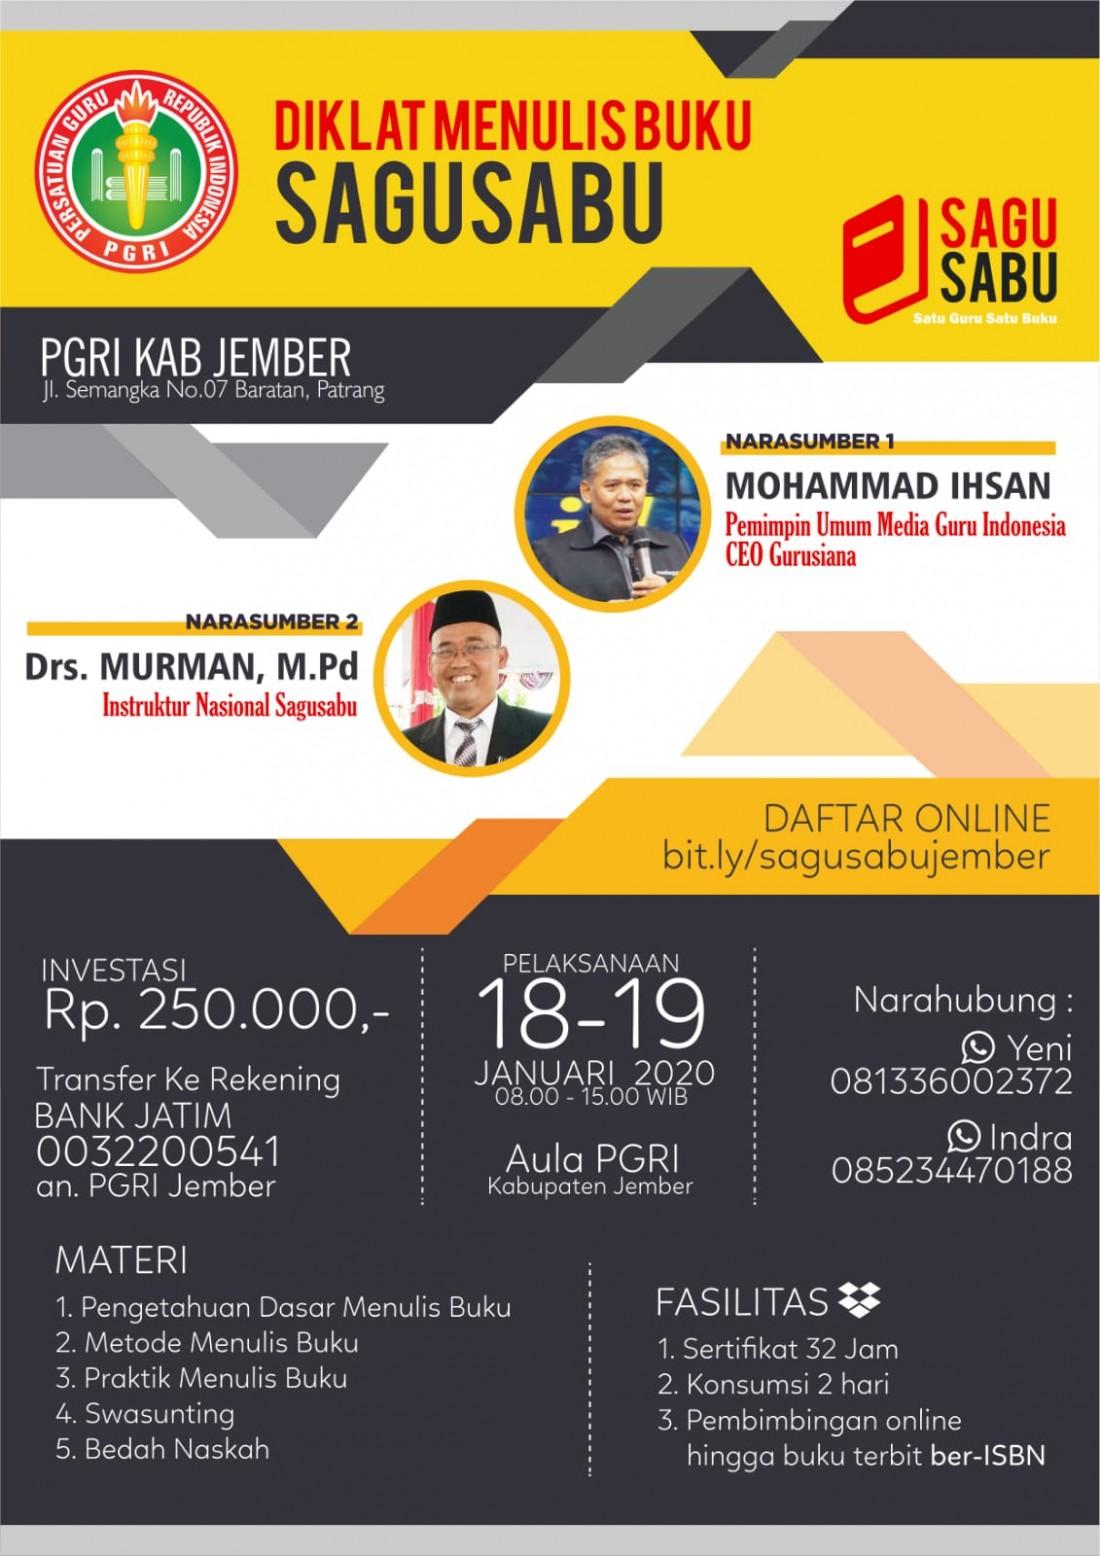 Pelatihan Menulis Satu Guru Satu Buku (Sagusabu) PGRI Jember (18 - 19 Januari 2020)